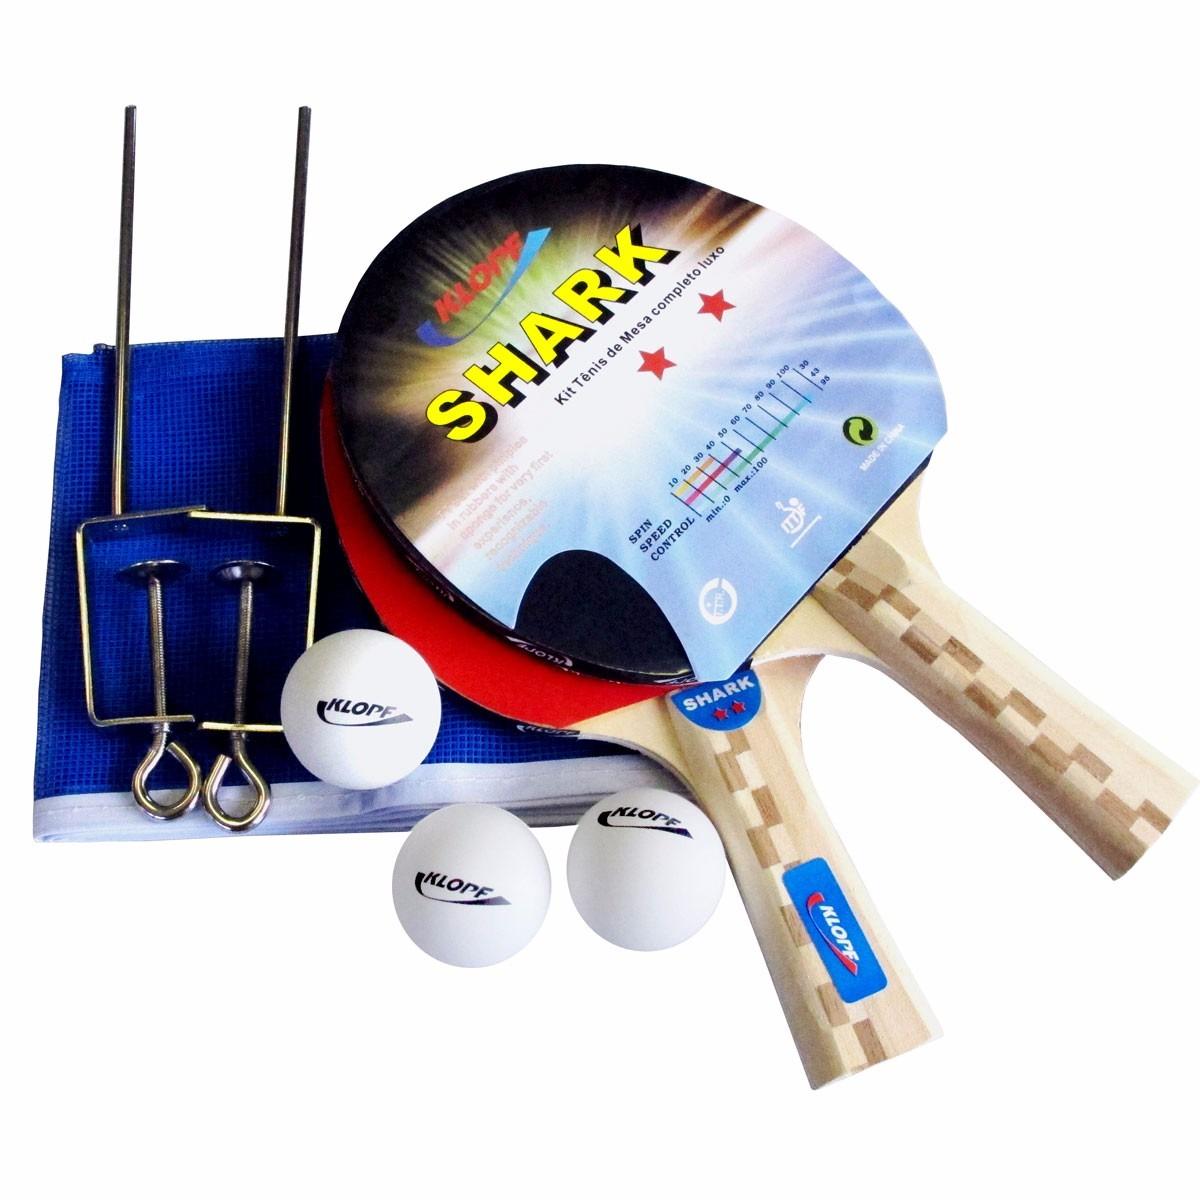 jg tênis mesa ping pong raquete rede bola suport klopf 5031. Carregando  zoom. 00b7f033718ee